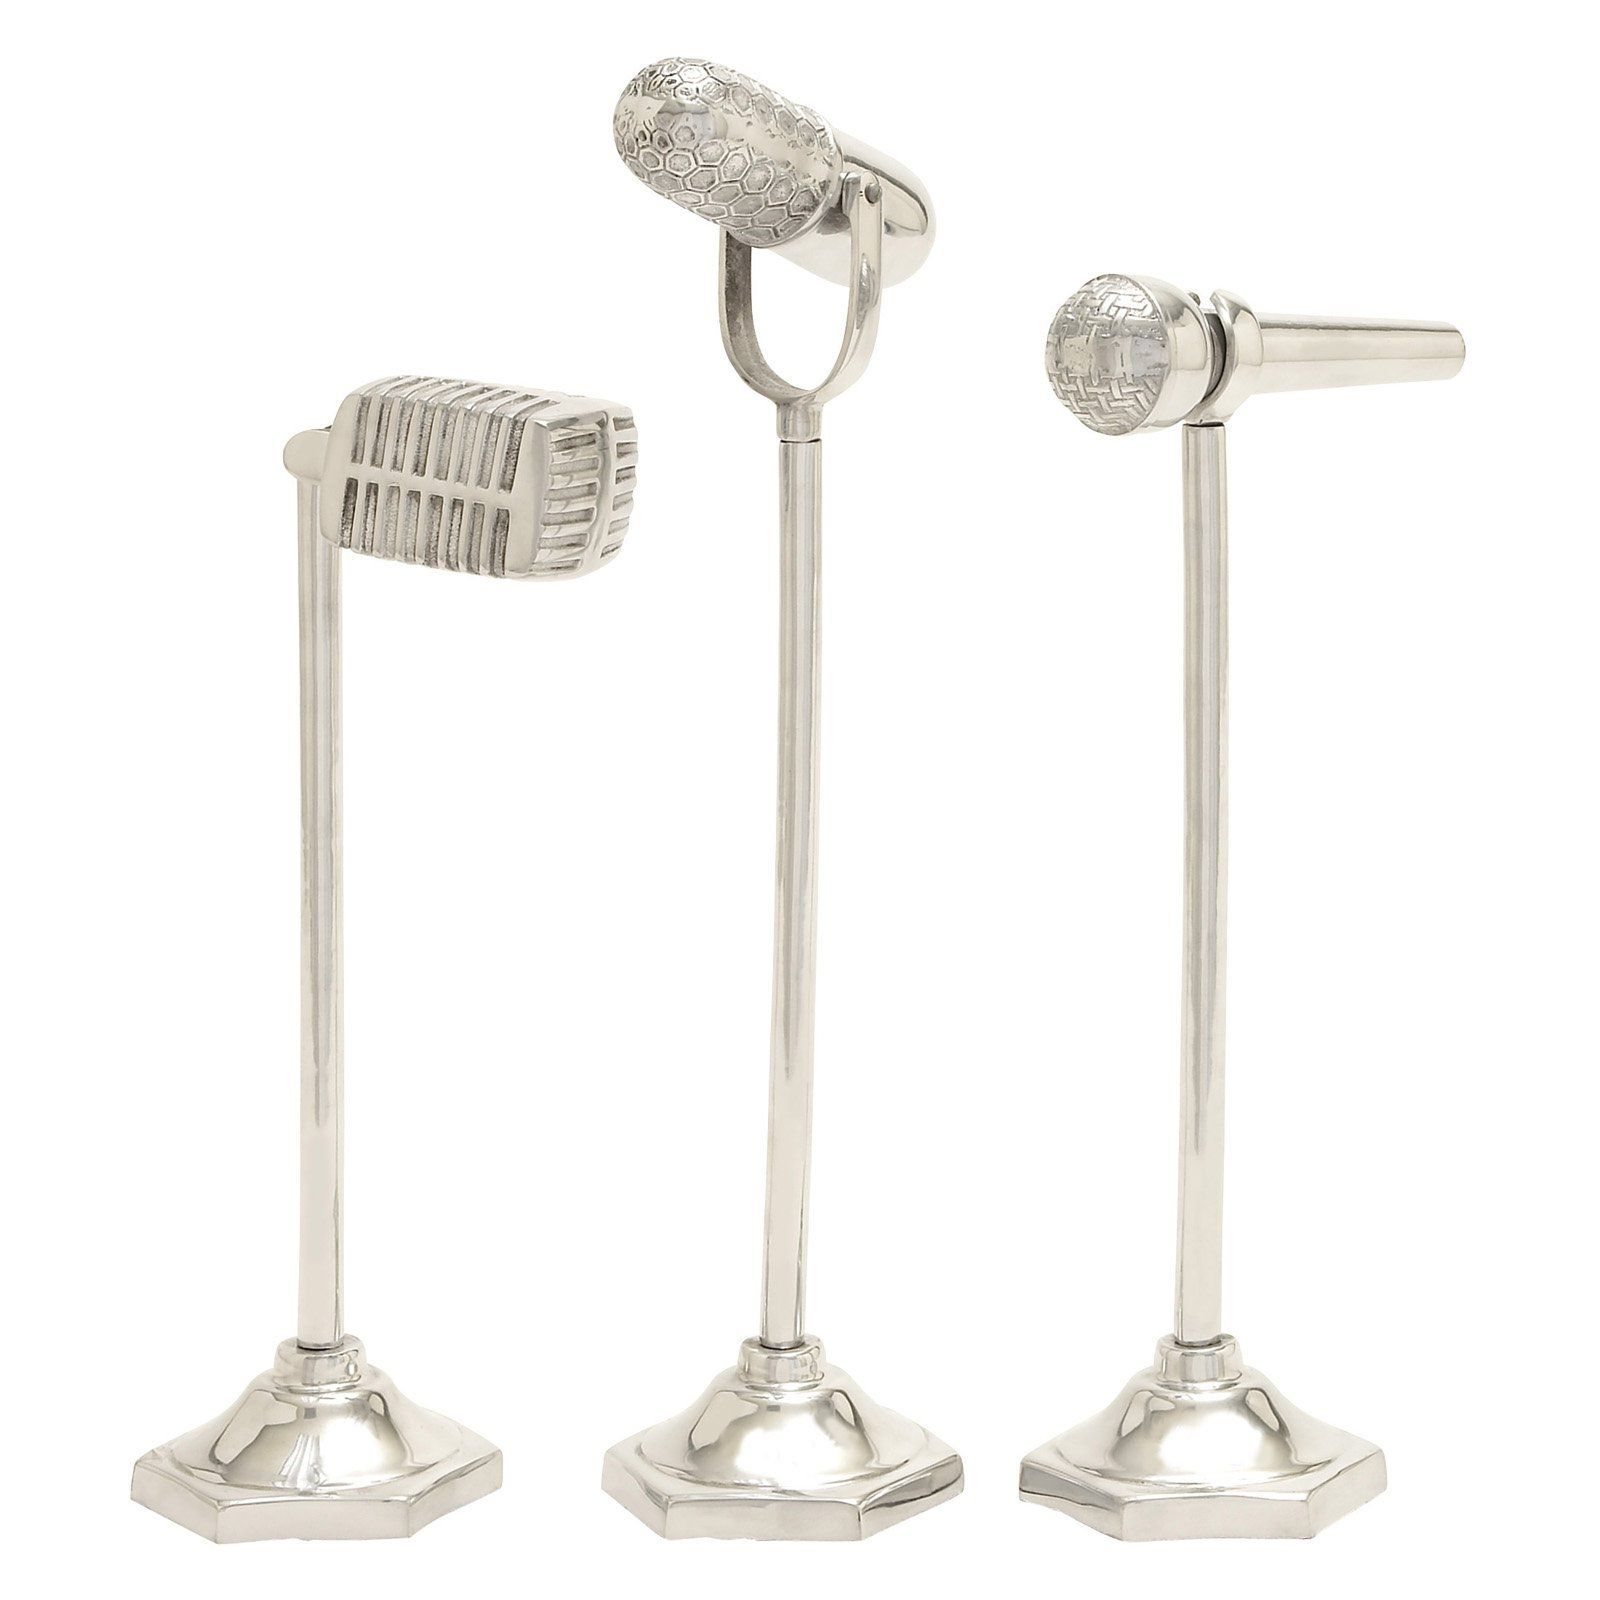 DecMode 3 Piece Microphone Decorative Sculptures | from hayneedle.com